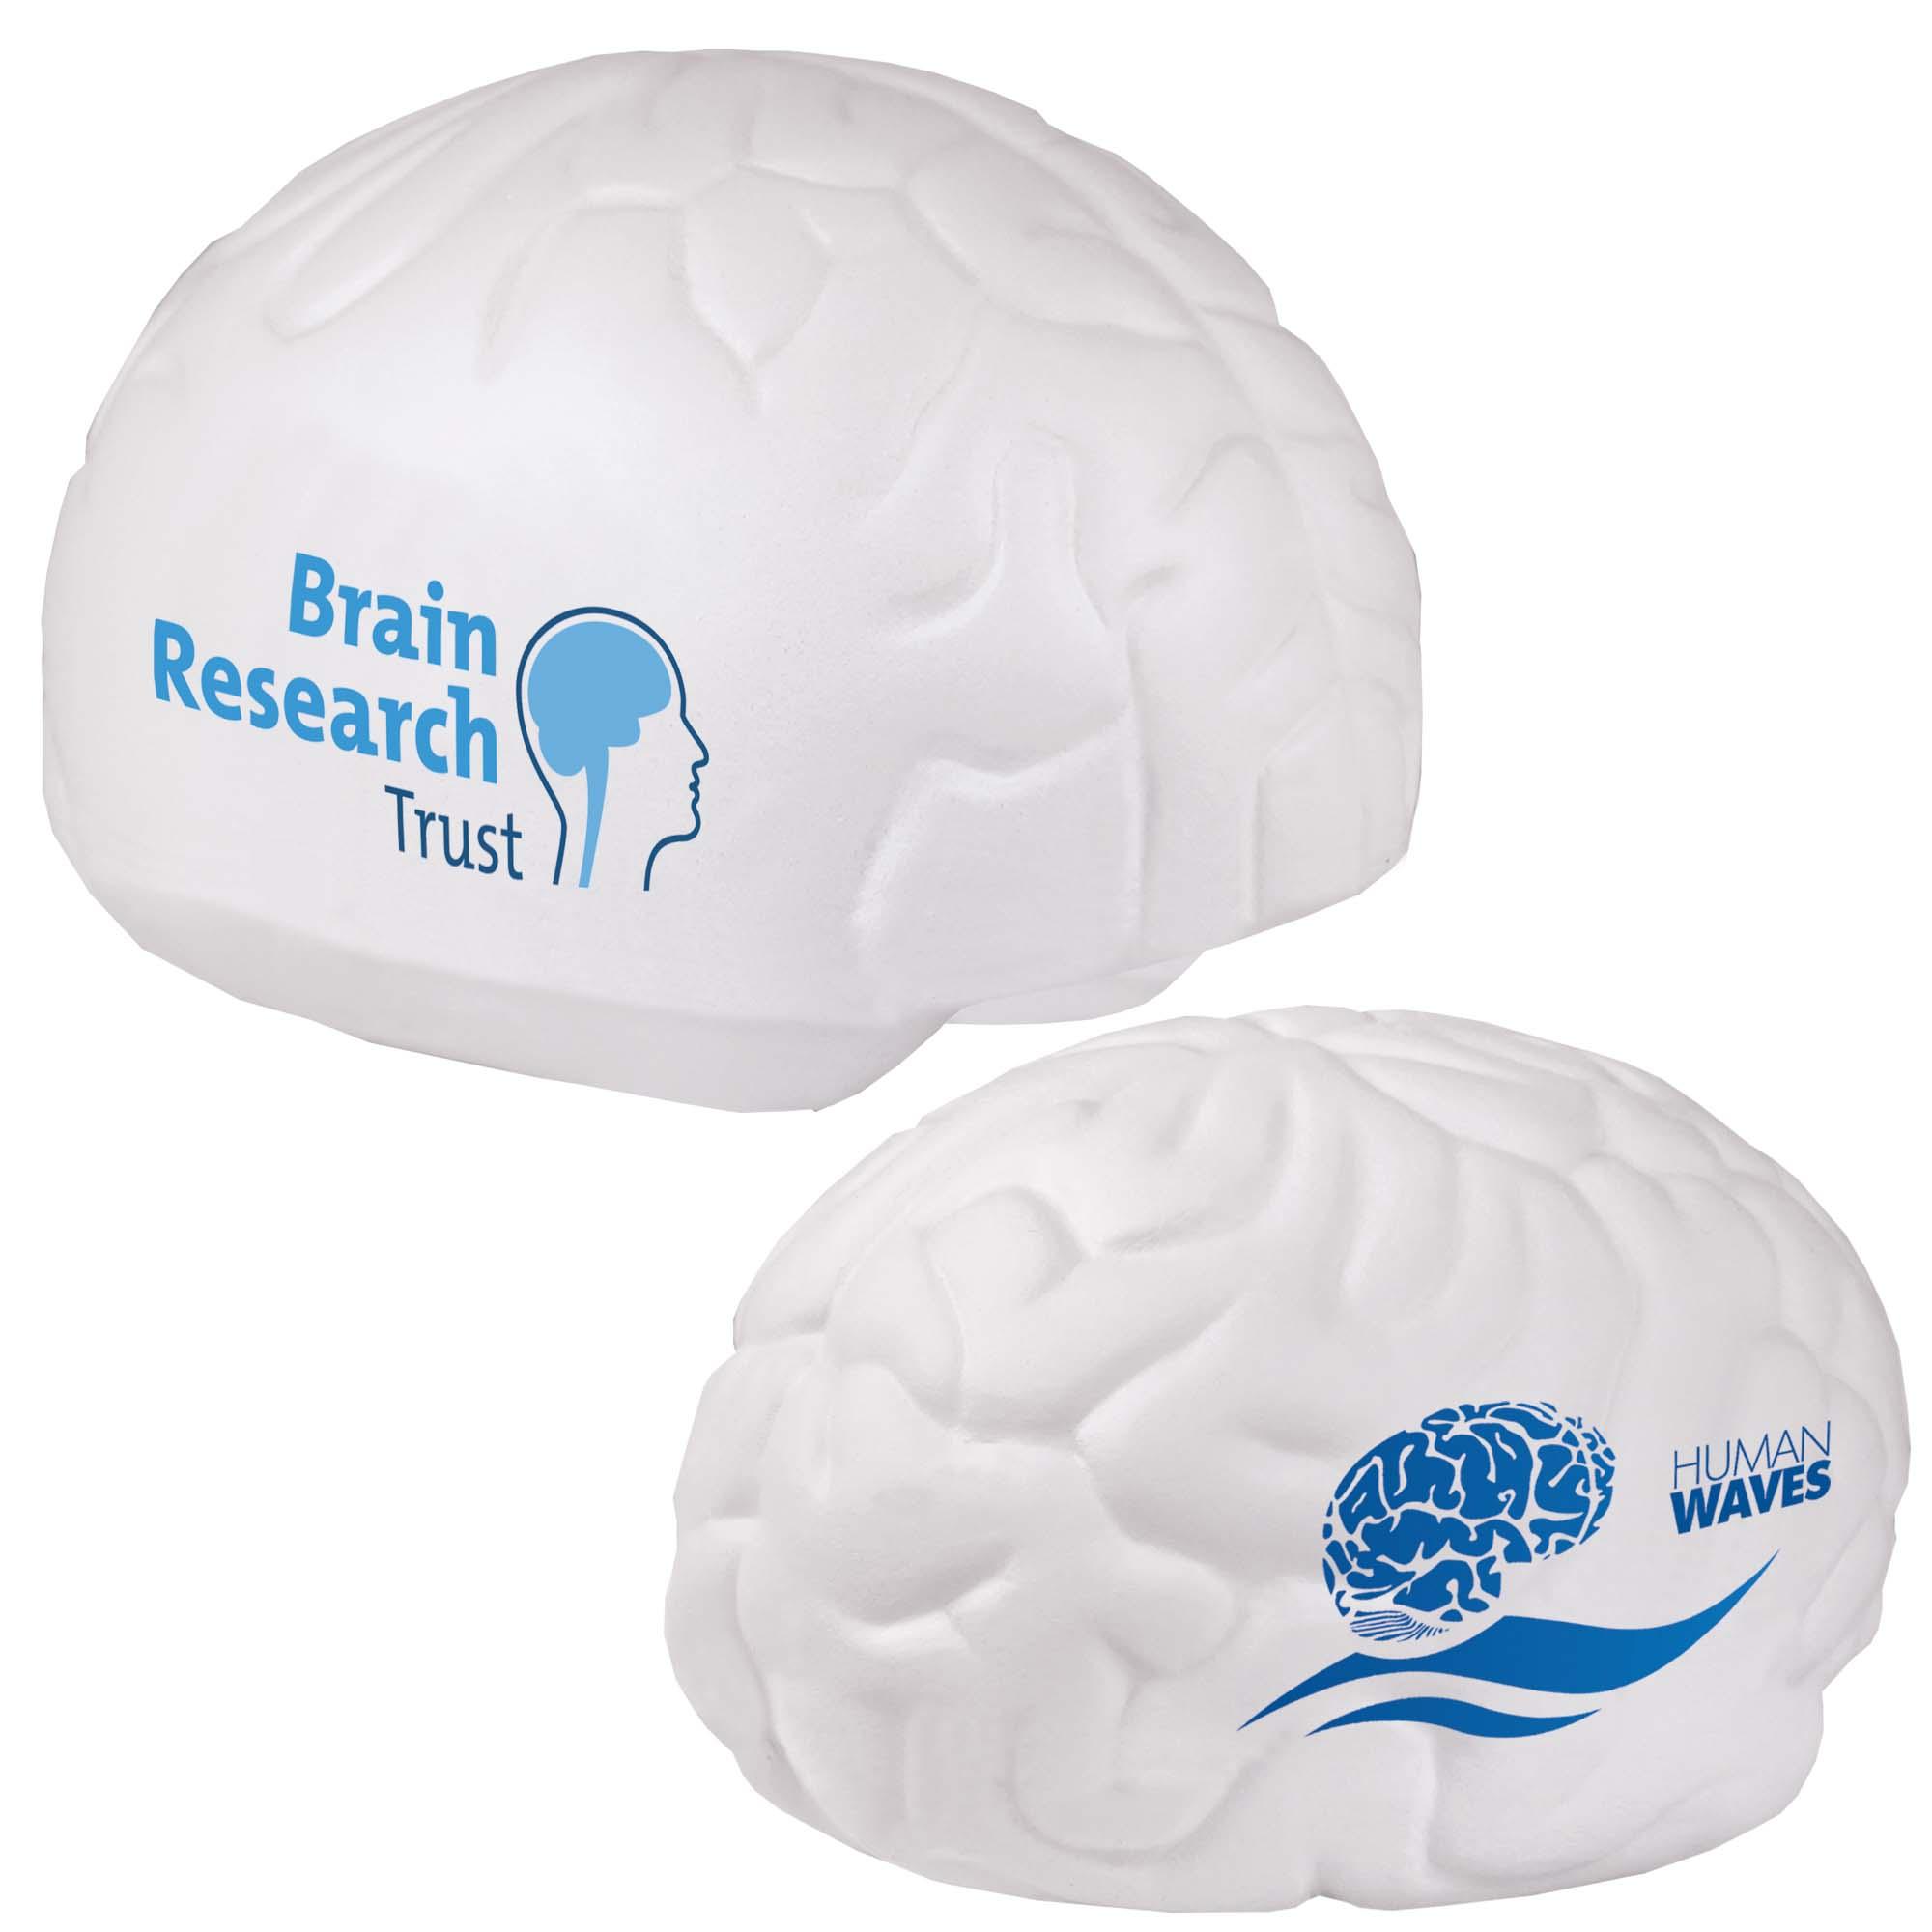 Promotional Stress Brain